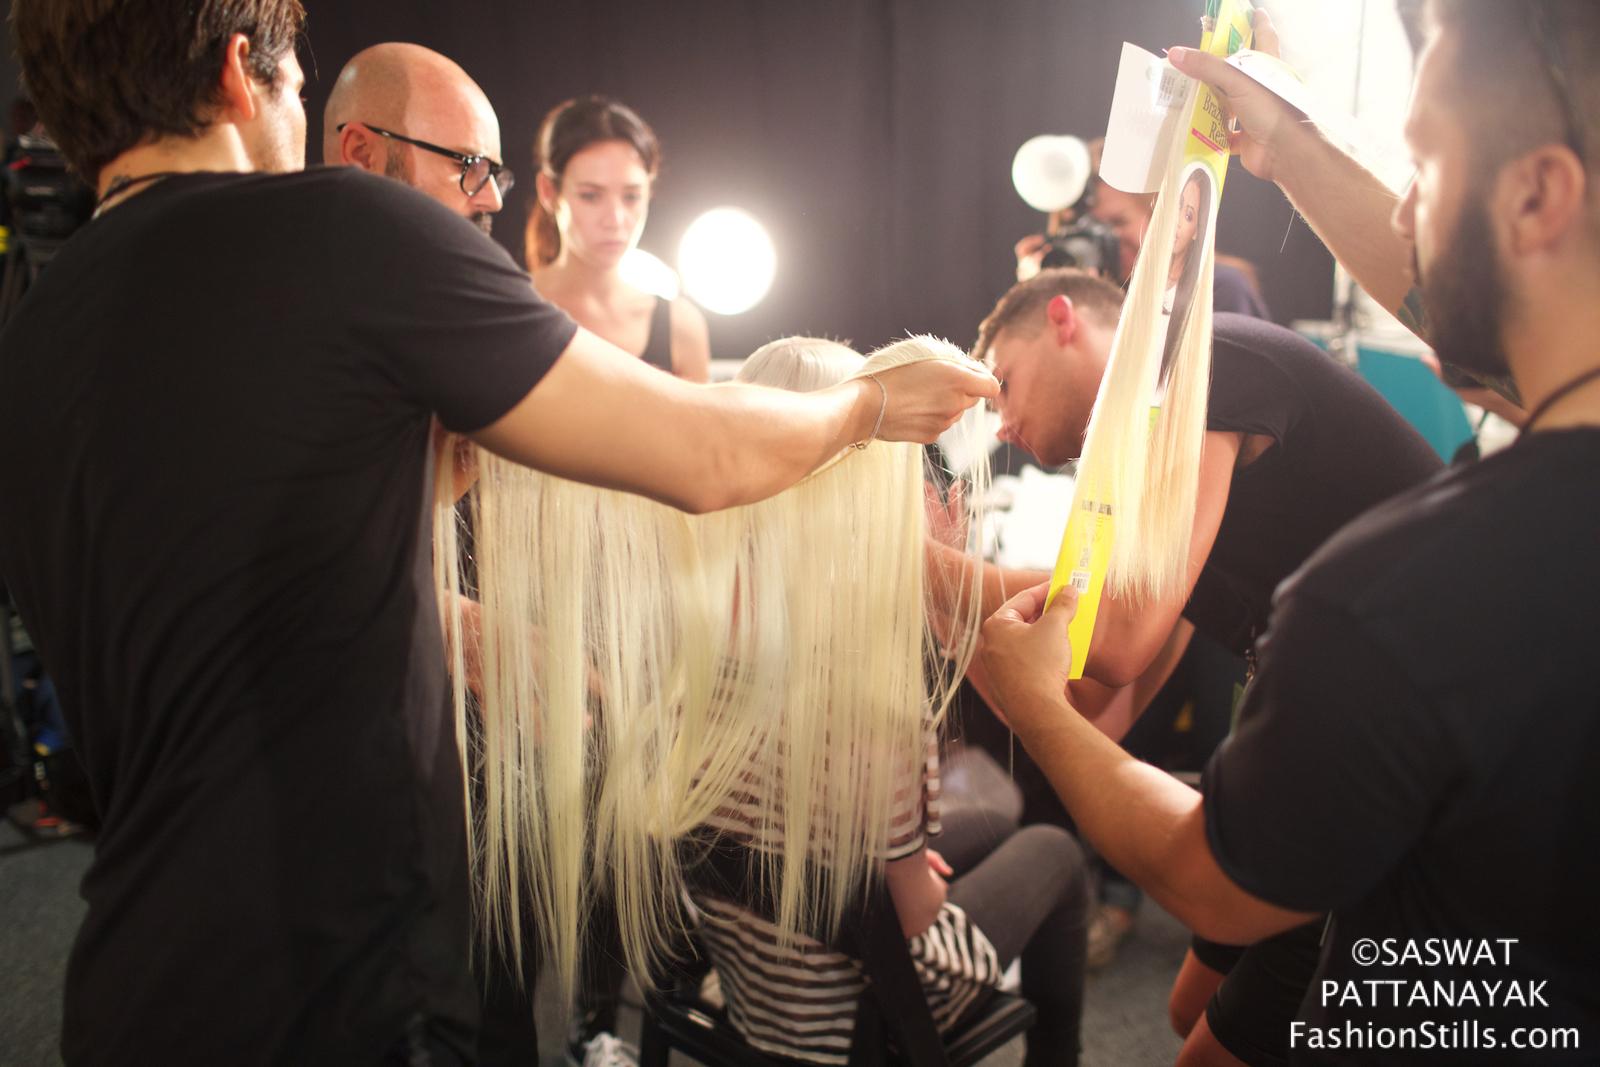 Nicholas-K-backstage-Saswat27.jpg